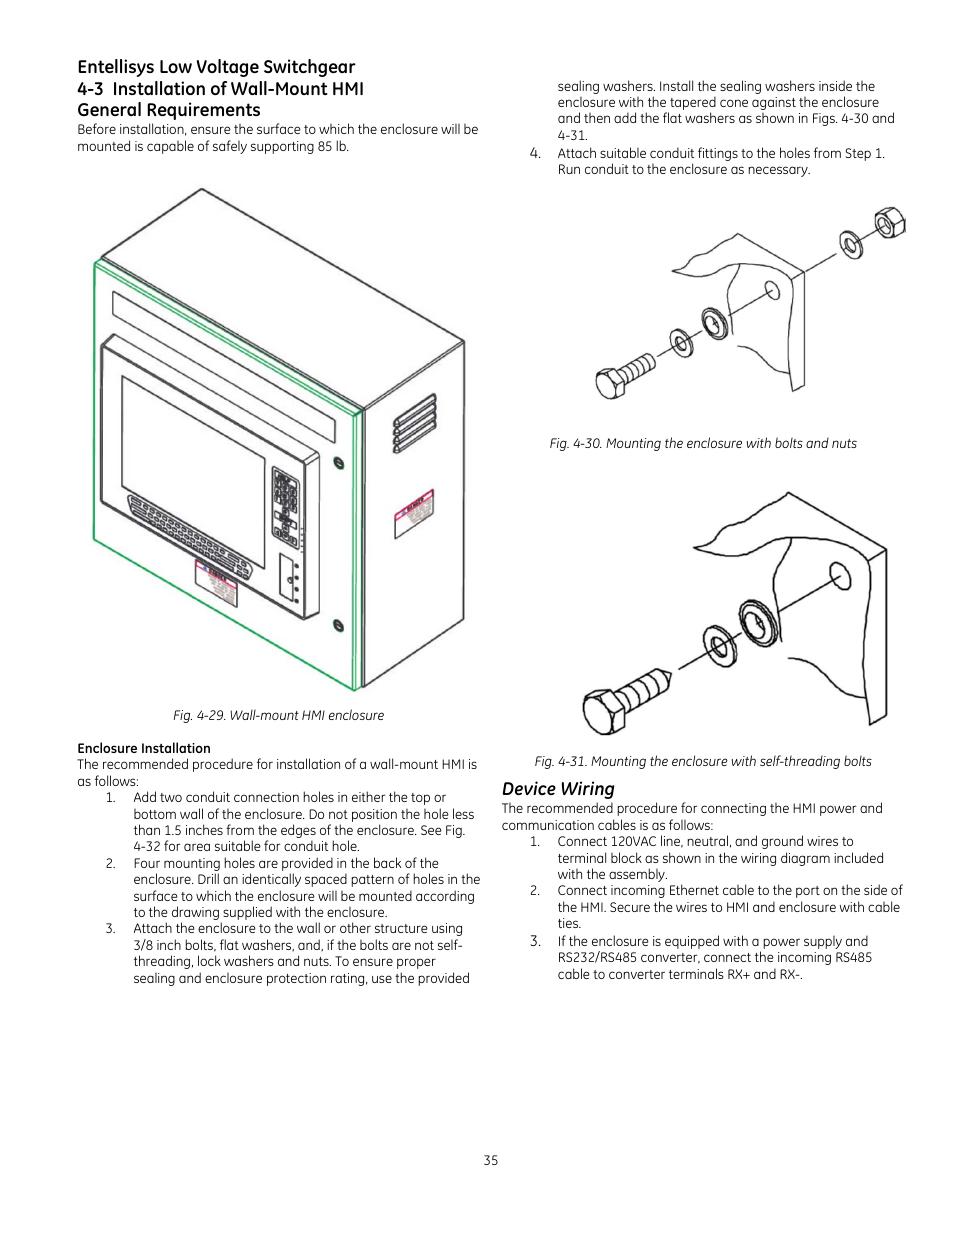 Entellisys low voltage switchgear, Device wiring | GE ... on